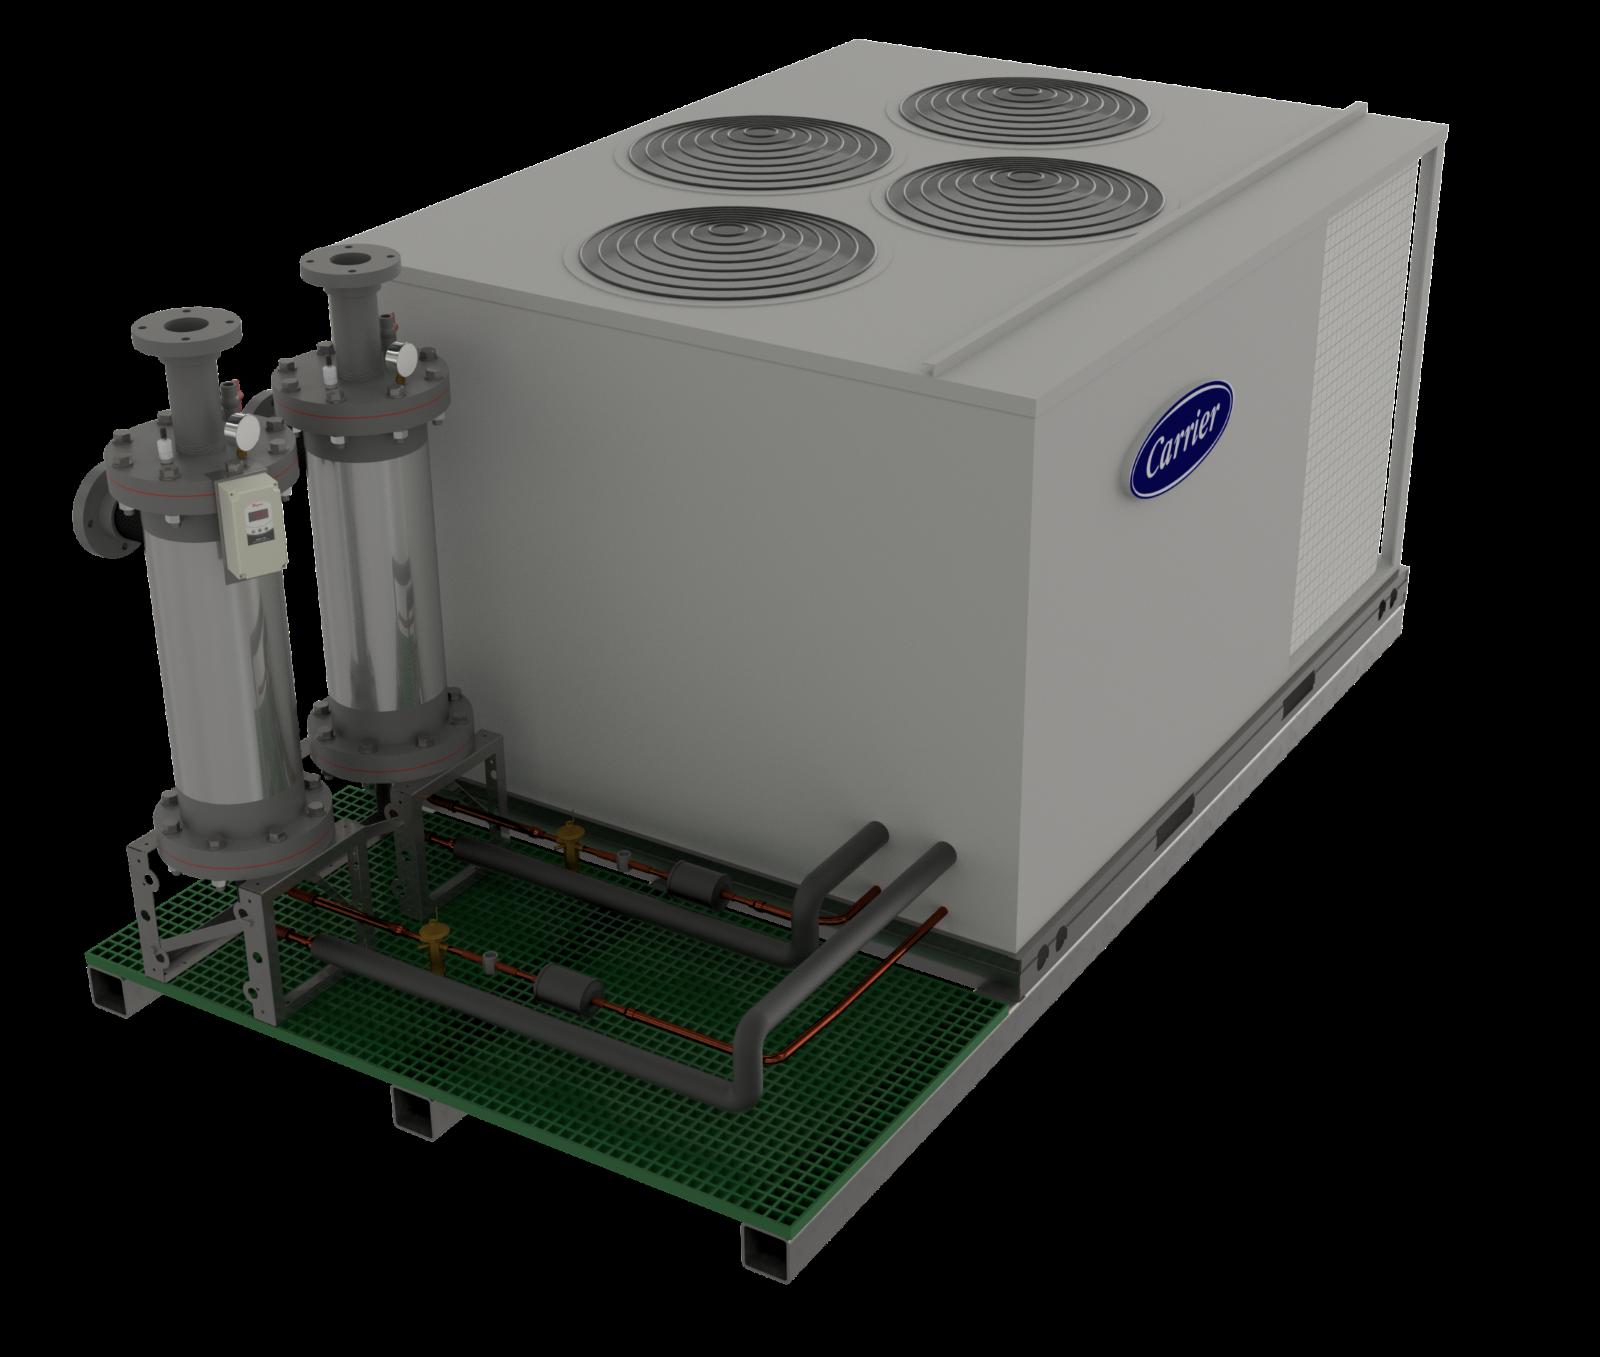 2 ton Commercial Chillers & Heat Pumps